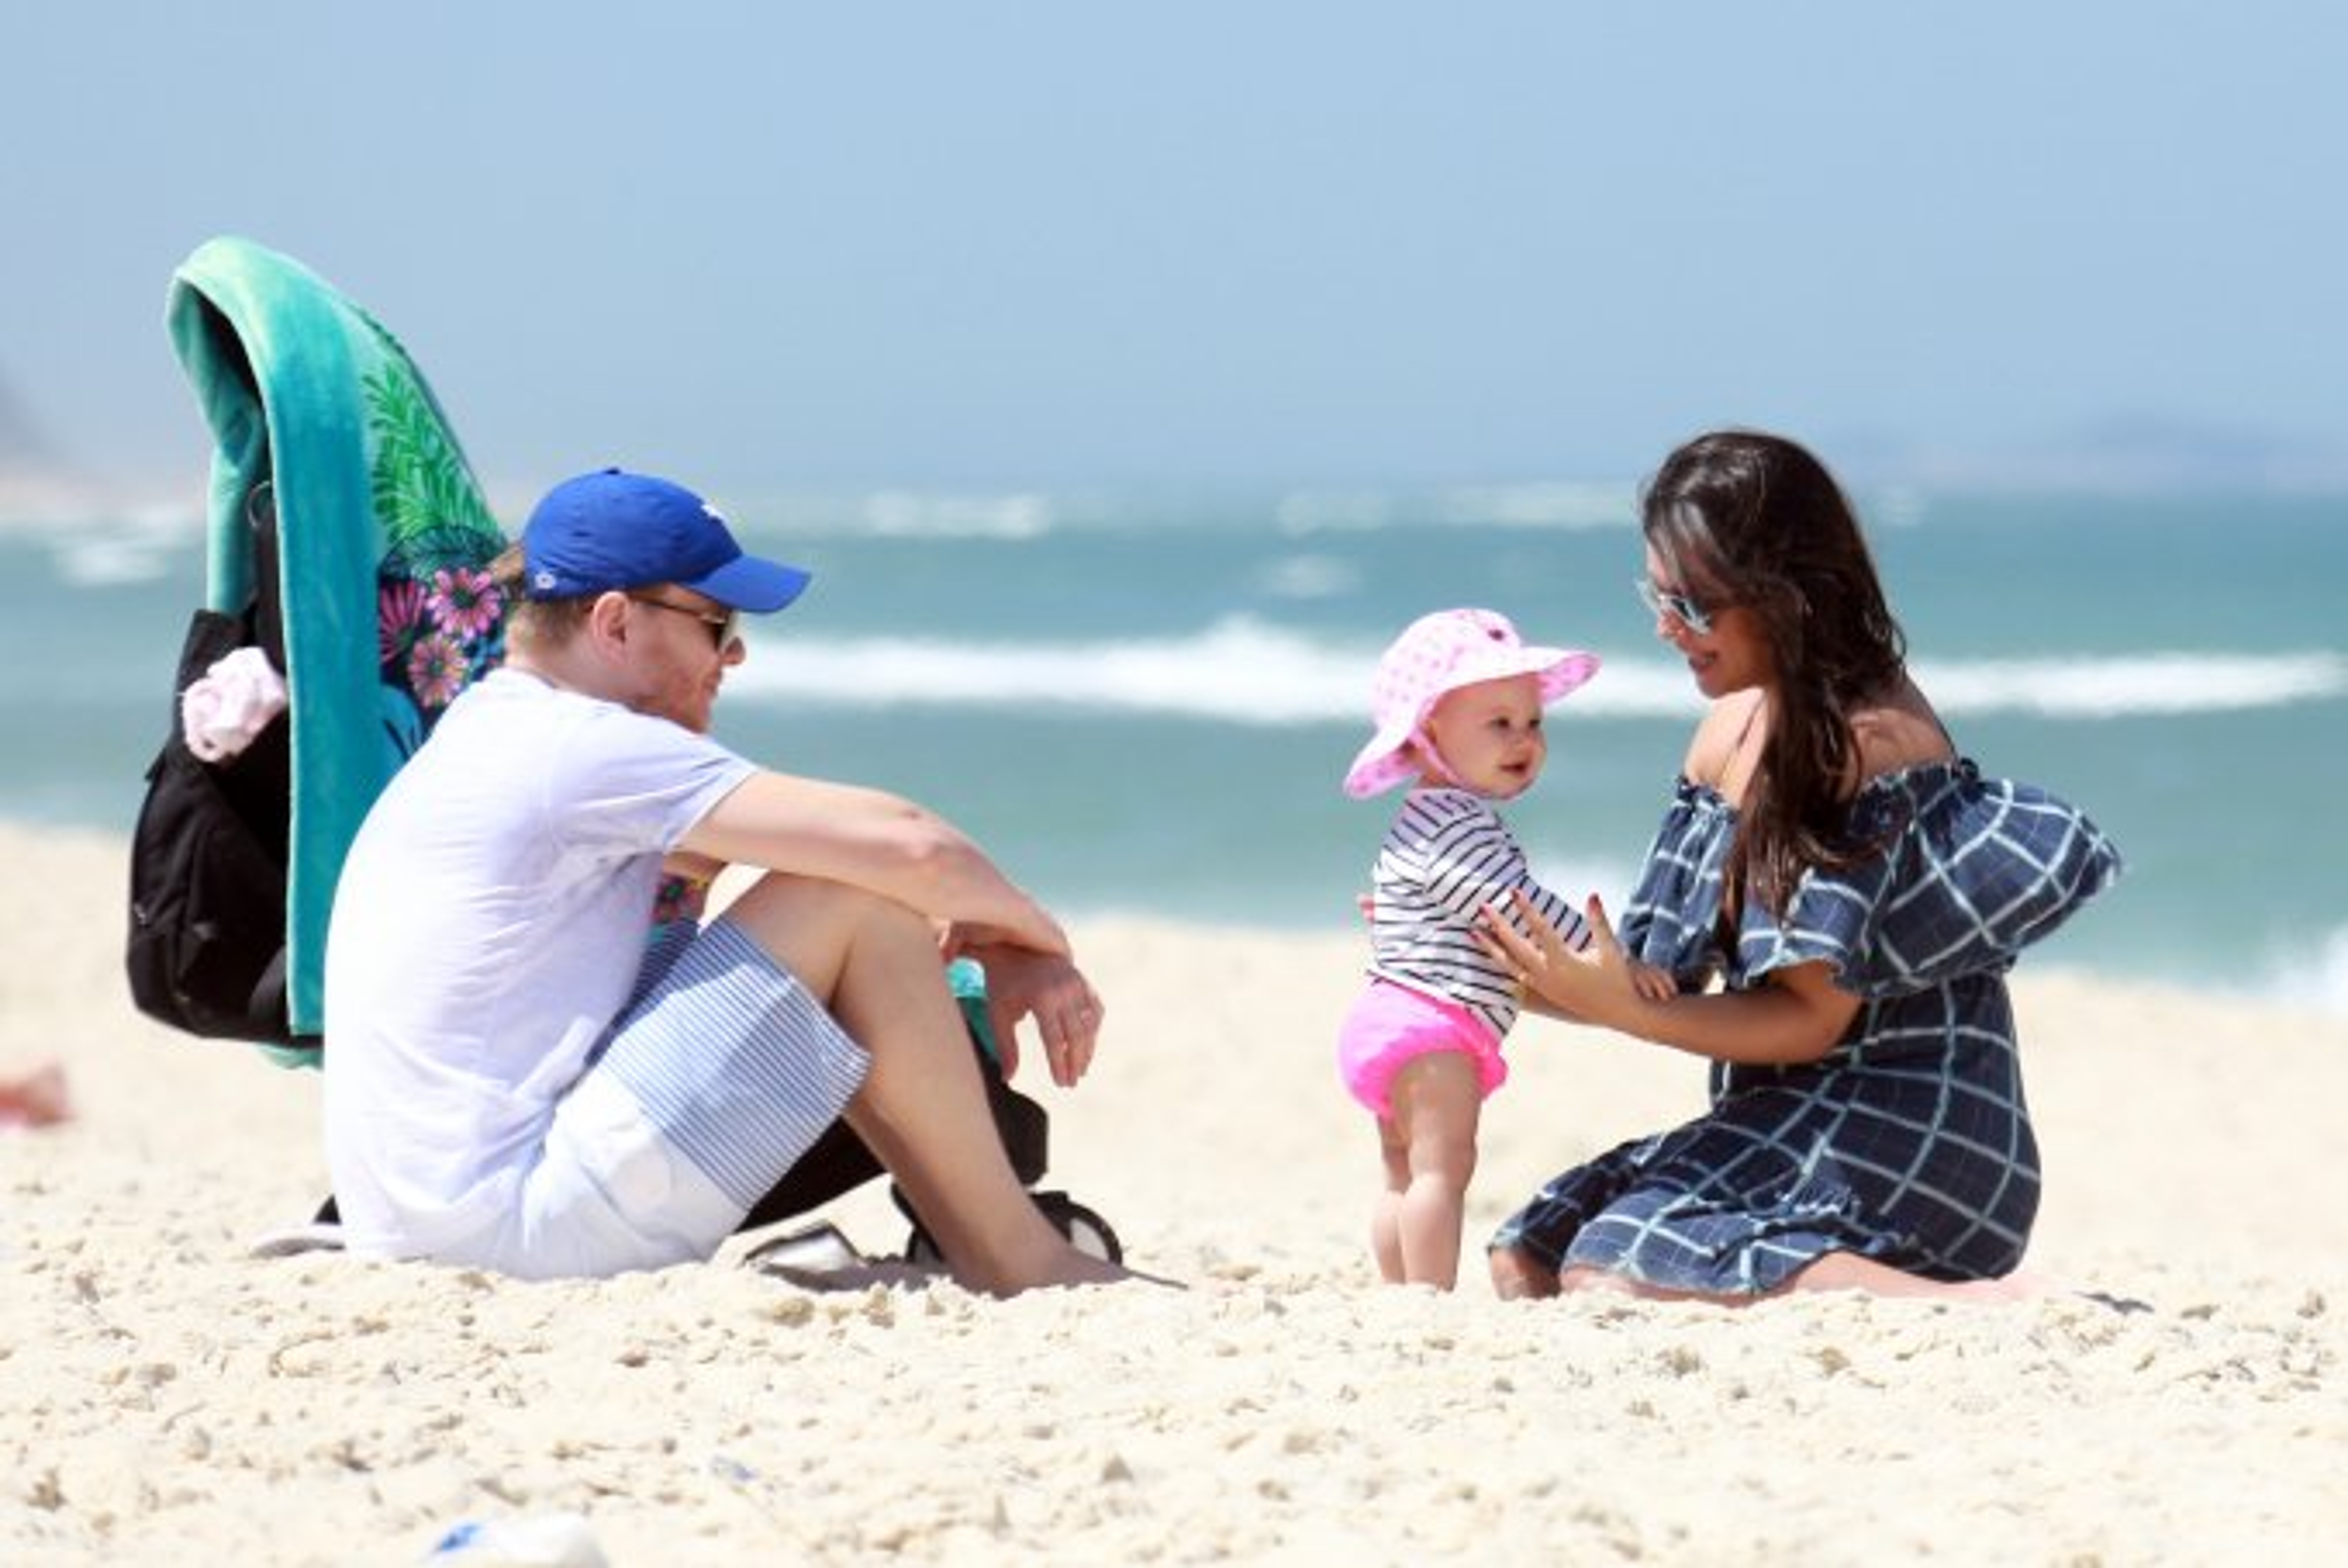 Michel Teló, Thais Fersoza e Melinda na praia